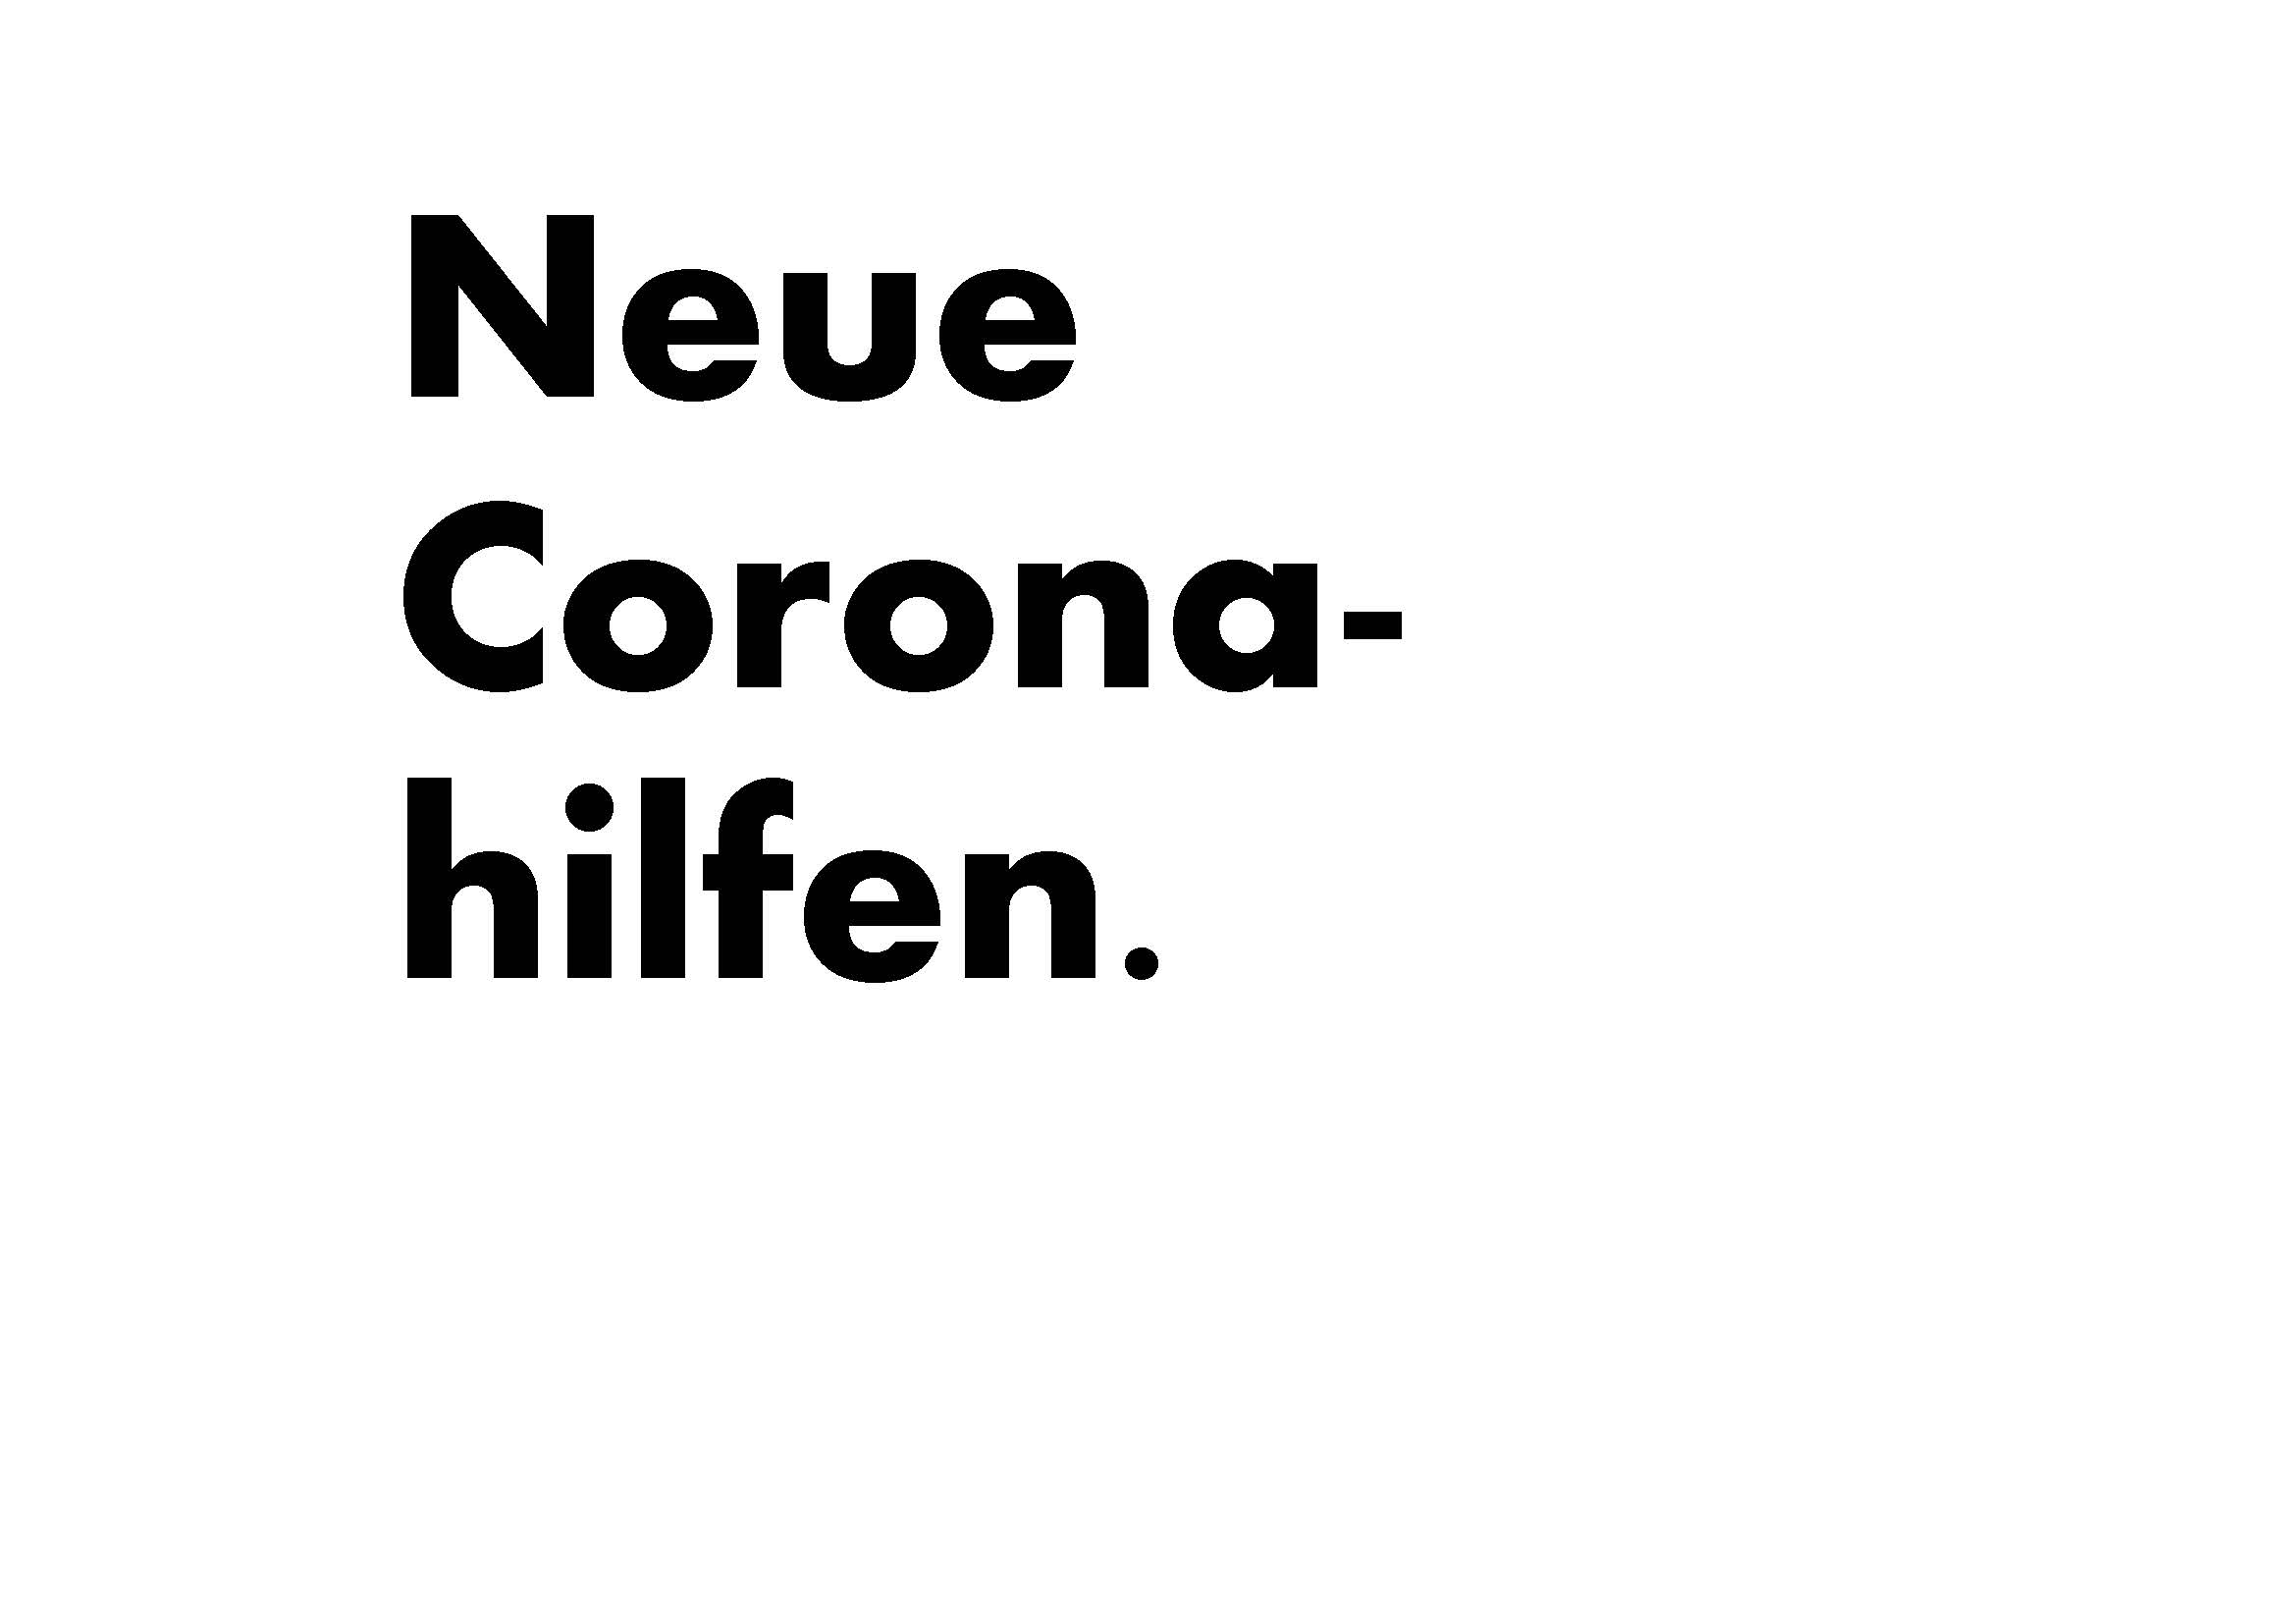 Neue Coronahilfen